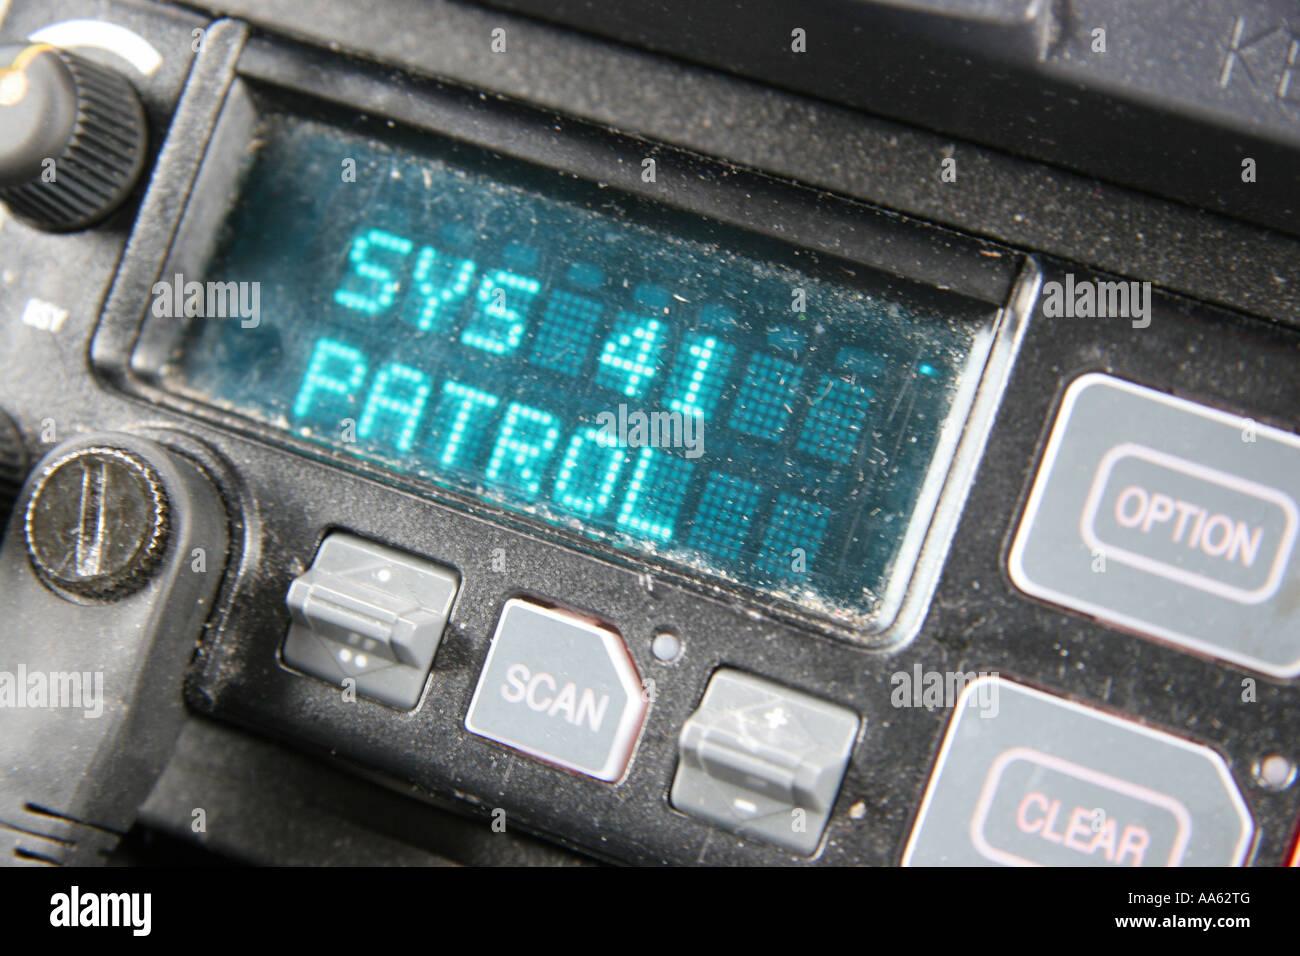 police car interior radio stock photos police car interior radio stock images alamy. Black Bedroom Furniture Sets. Home Design Ideas